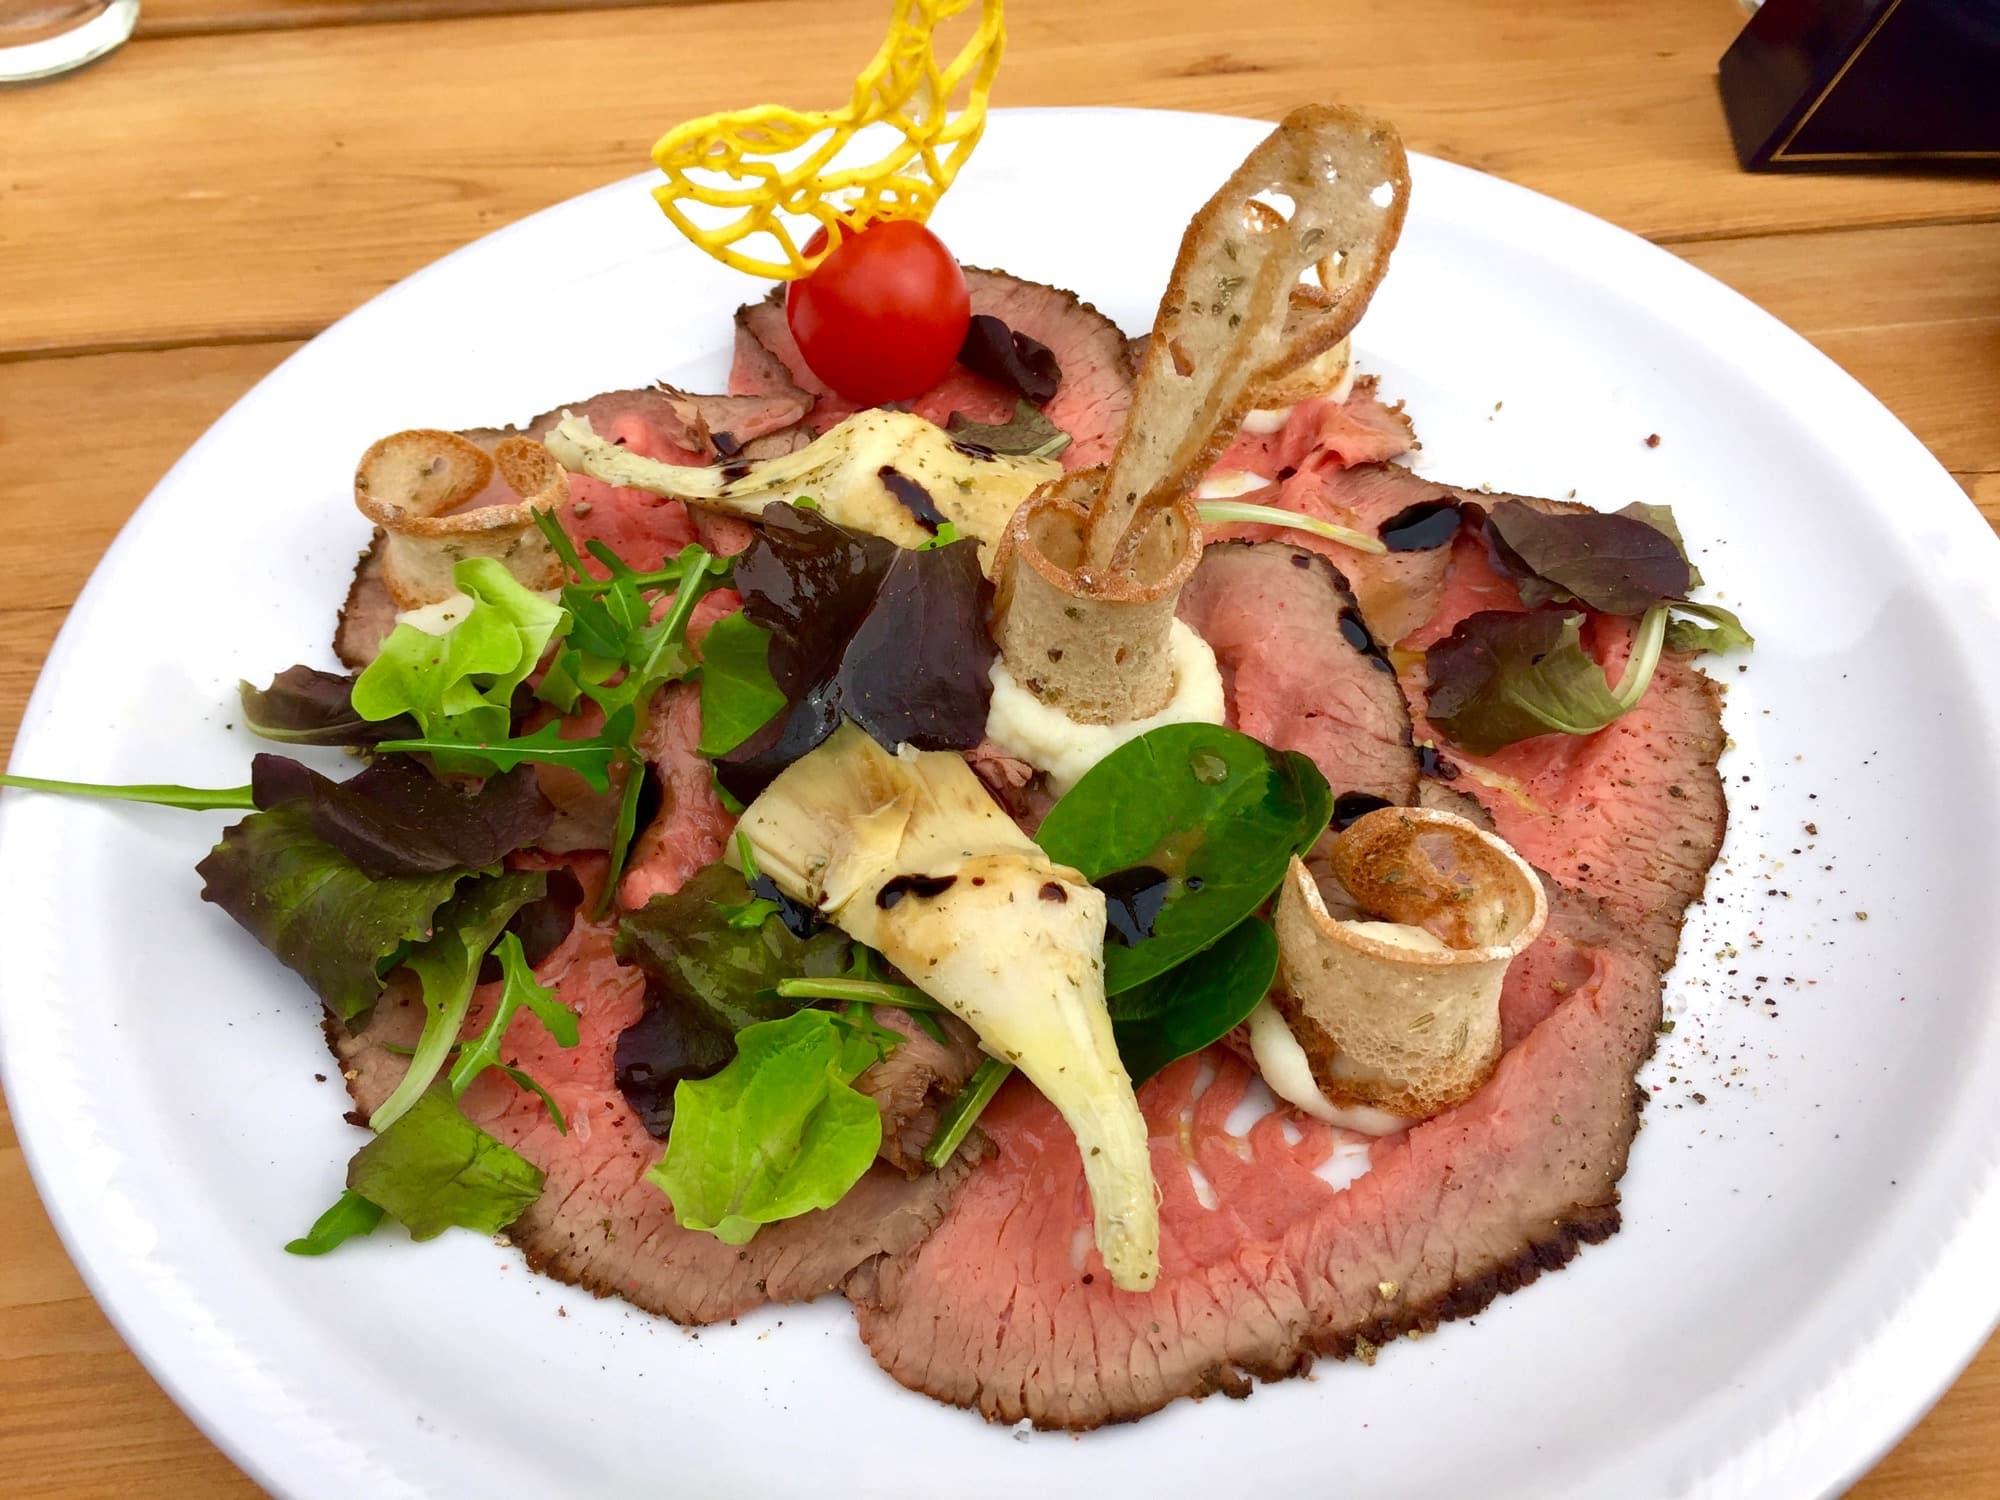 Beste restaurants Zuid-Tirol - 1 (2)